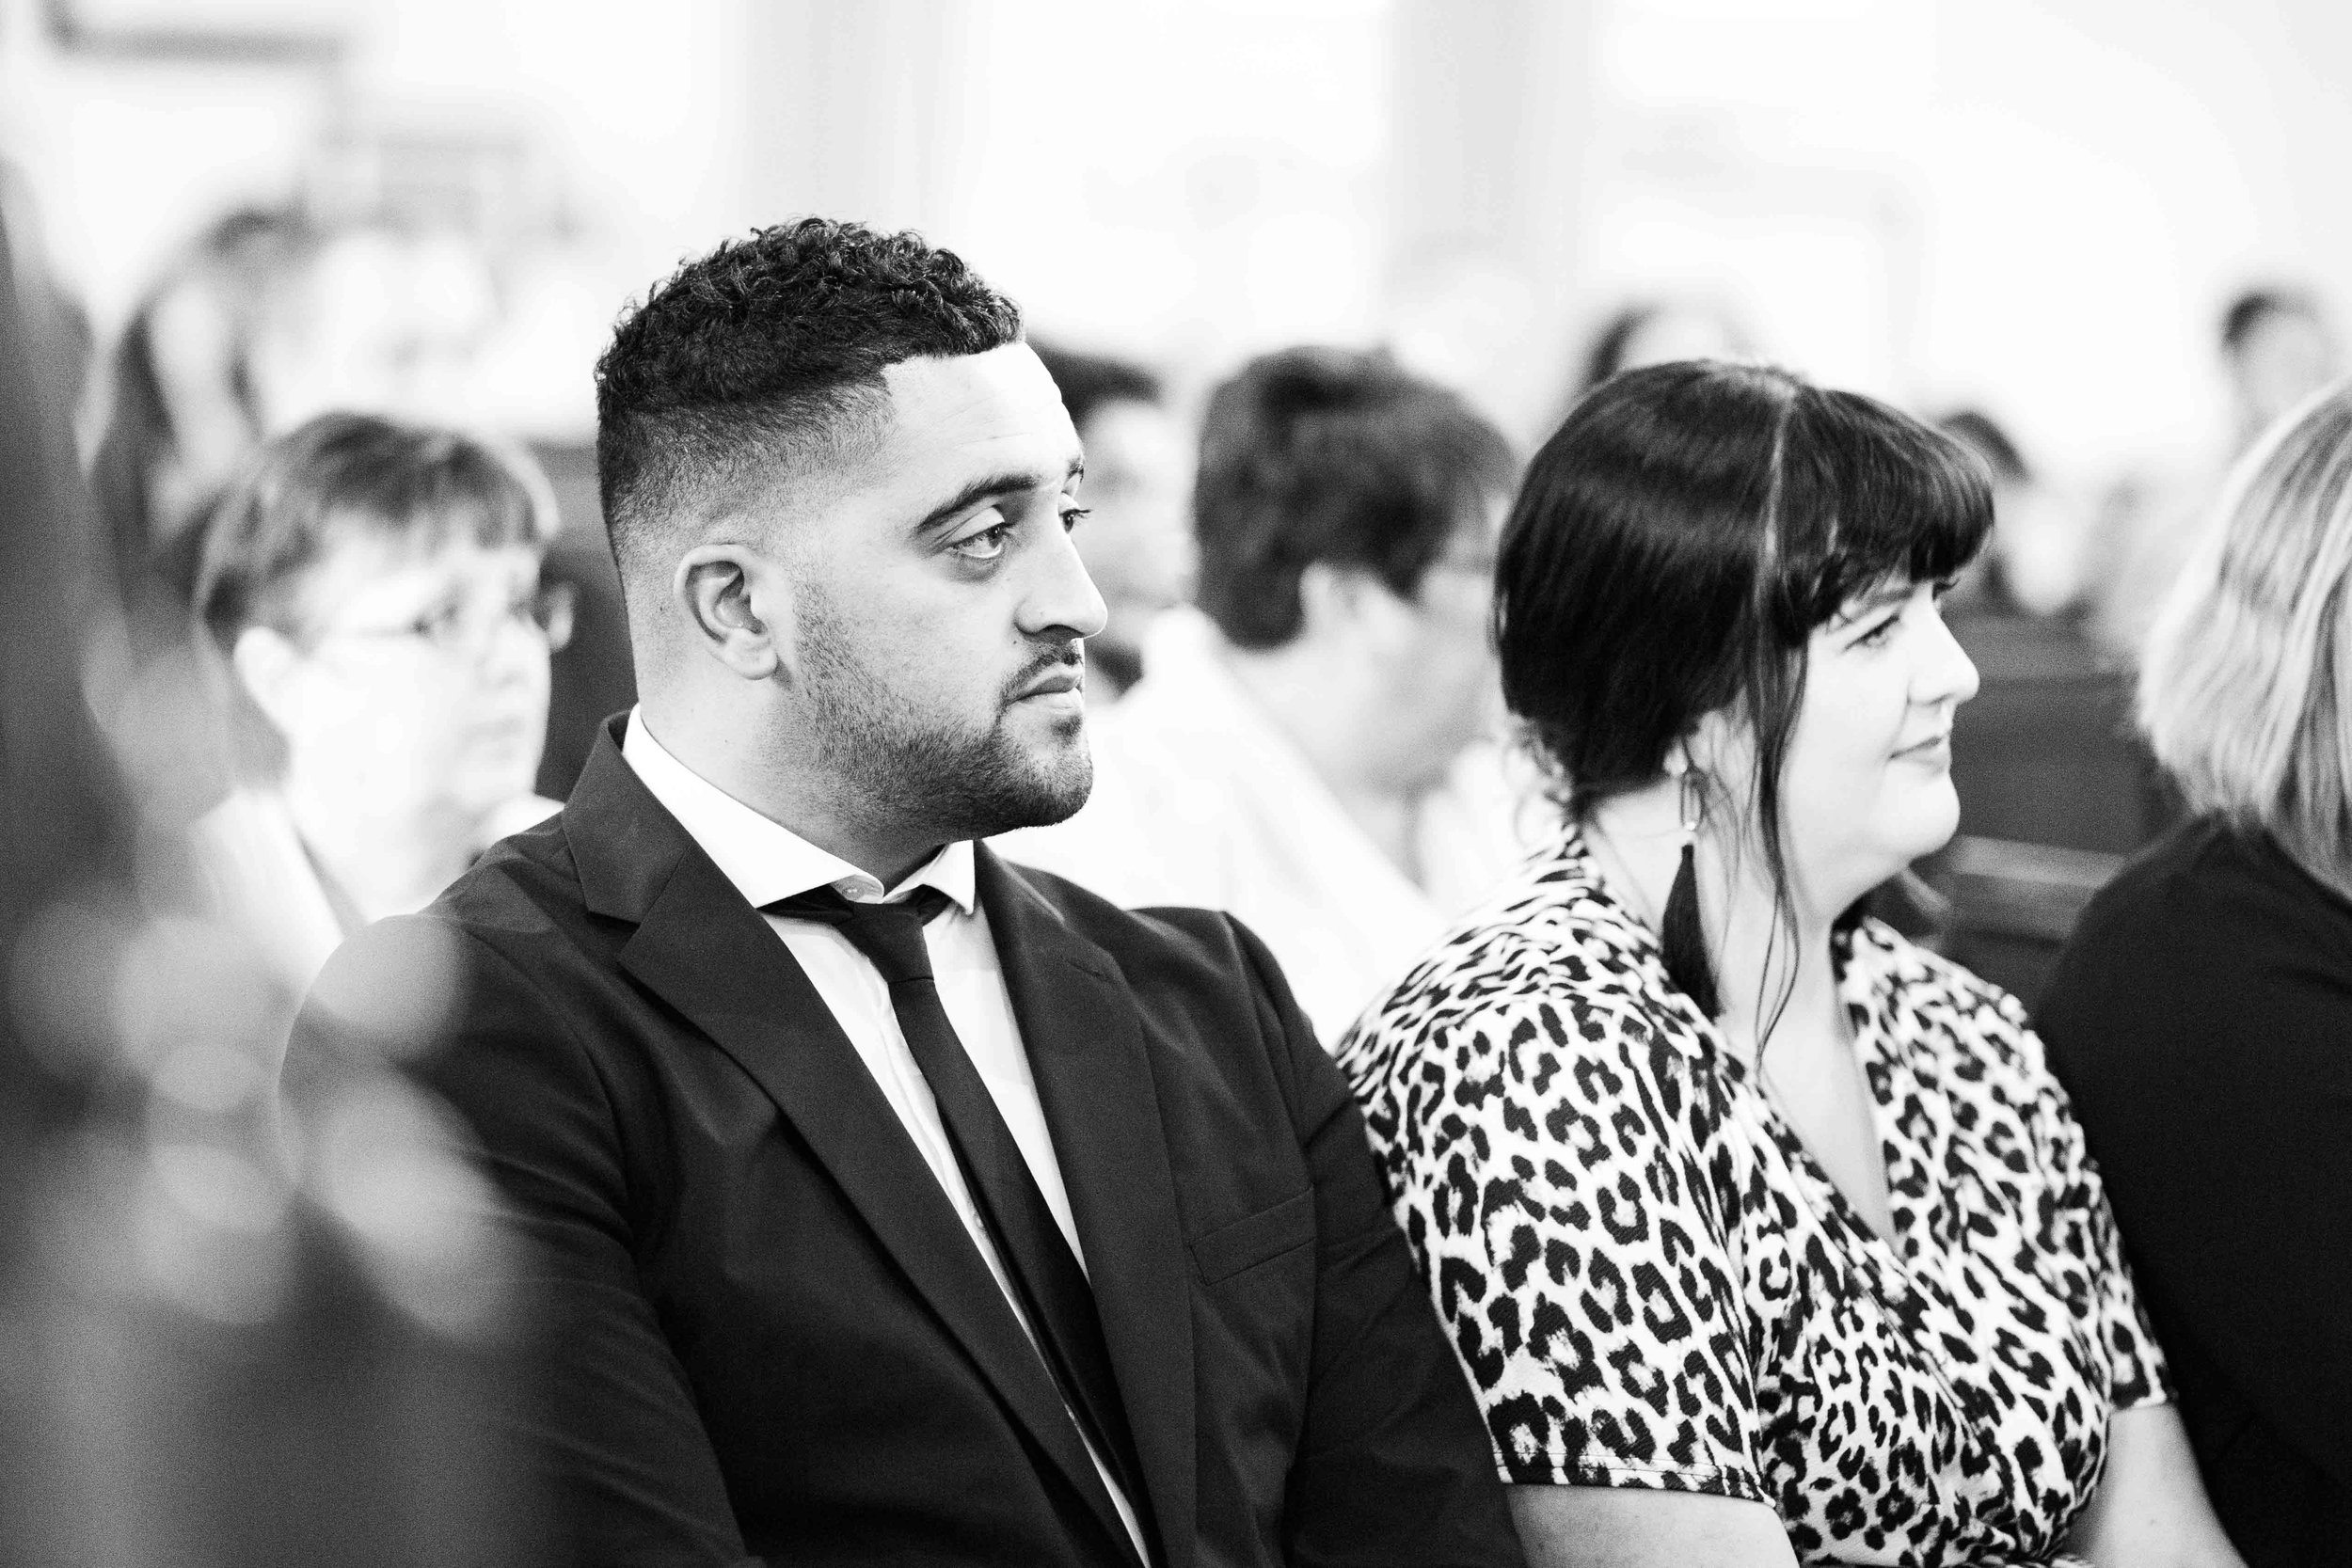 Lea-cooper-photography-christening-photographer-baptism-wolverhampton-wednesbury-walsall-willenhall-dudley-church-chapel-event-photography-8.jpg